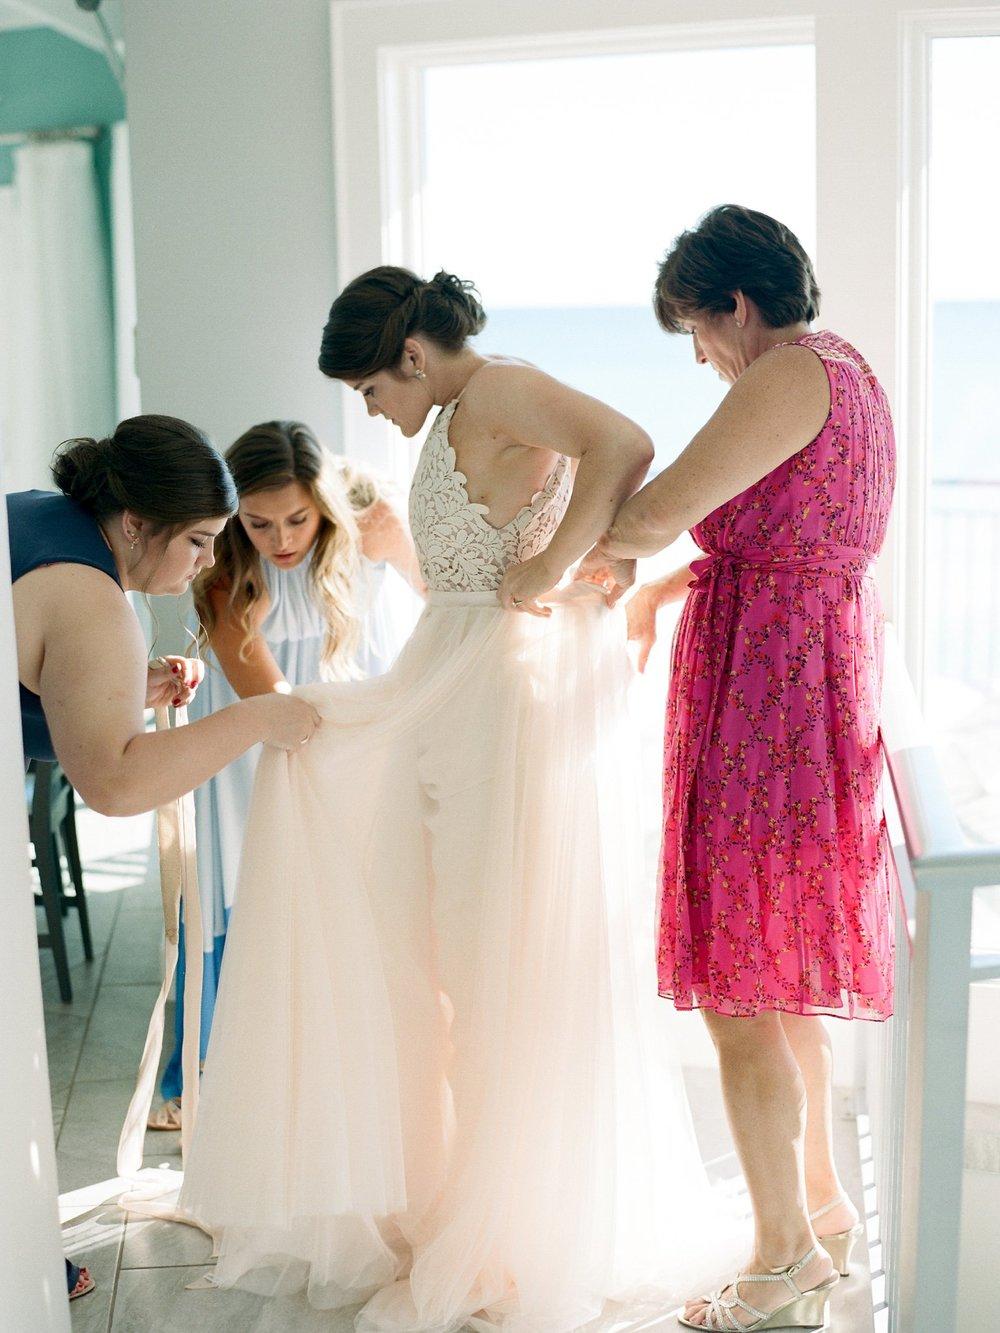 inlet beach wedding 30a wedding inlet beach wedding photographer shannon griffin photography_0035.jpg